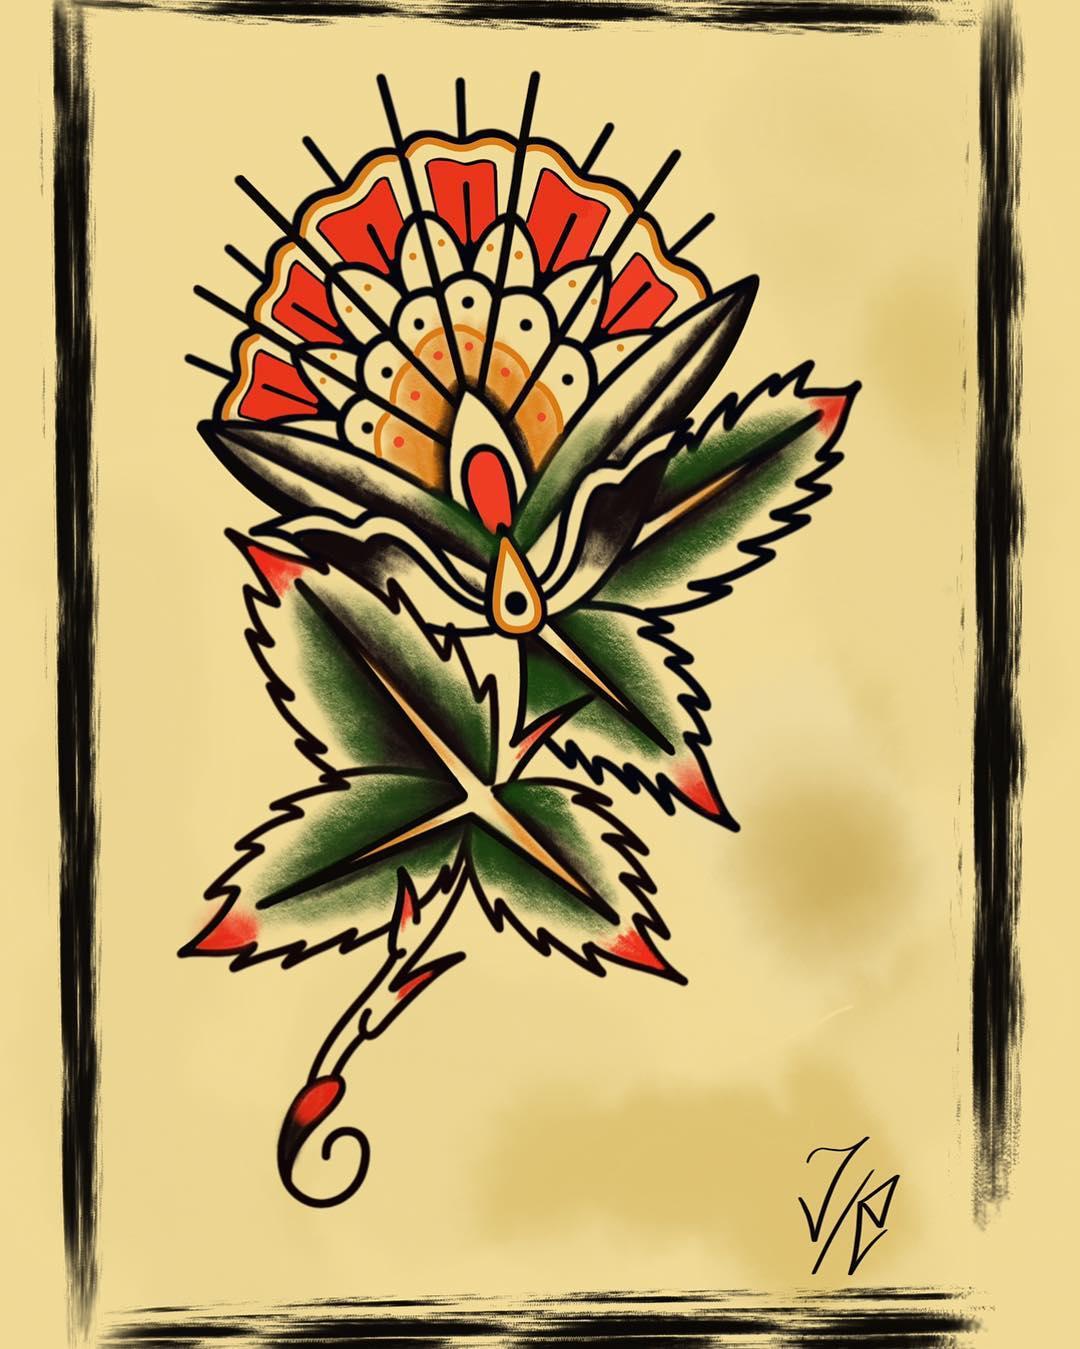 tattooart,art,artistic,old,oldschollshit,custommade,owl,tabasco,berlintattoo,barcelonatattoo,ibizatattoo,tabascotattooer,bestattooers,tradicionaltattooers,bestisbest,tatuajes,berlintattooers,ontheroad,classictattoo,oldlines,ciudadreal,malagatattooconvention,tradworkers,tradtattoo,follow4follow,followme,ciudadreal,castillalamancha,puertollano,oldlines,radtrad,fabnluxury